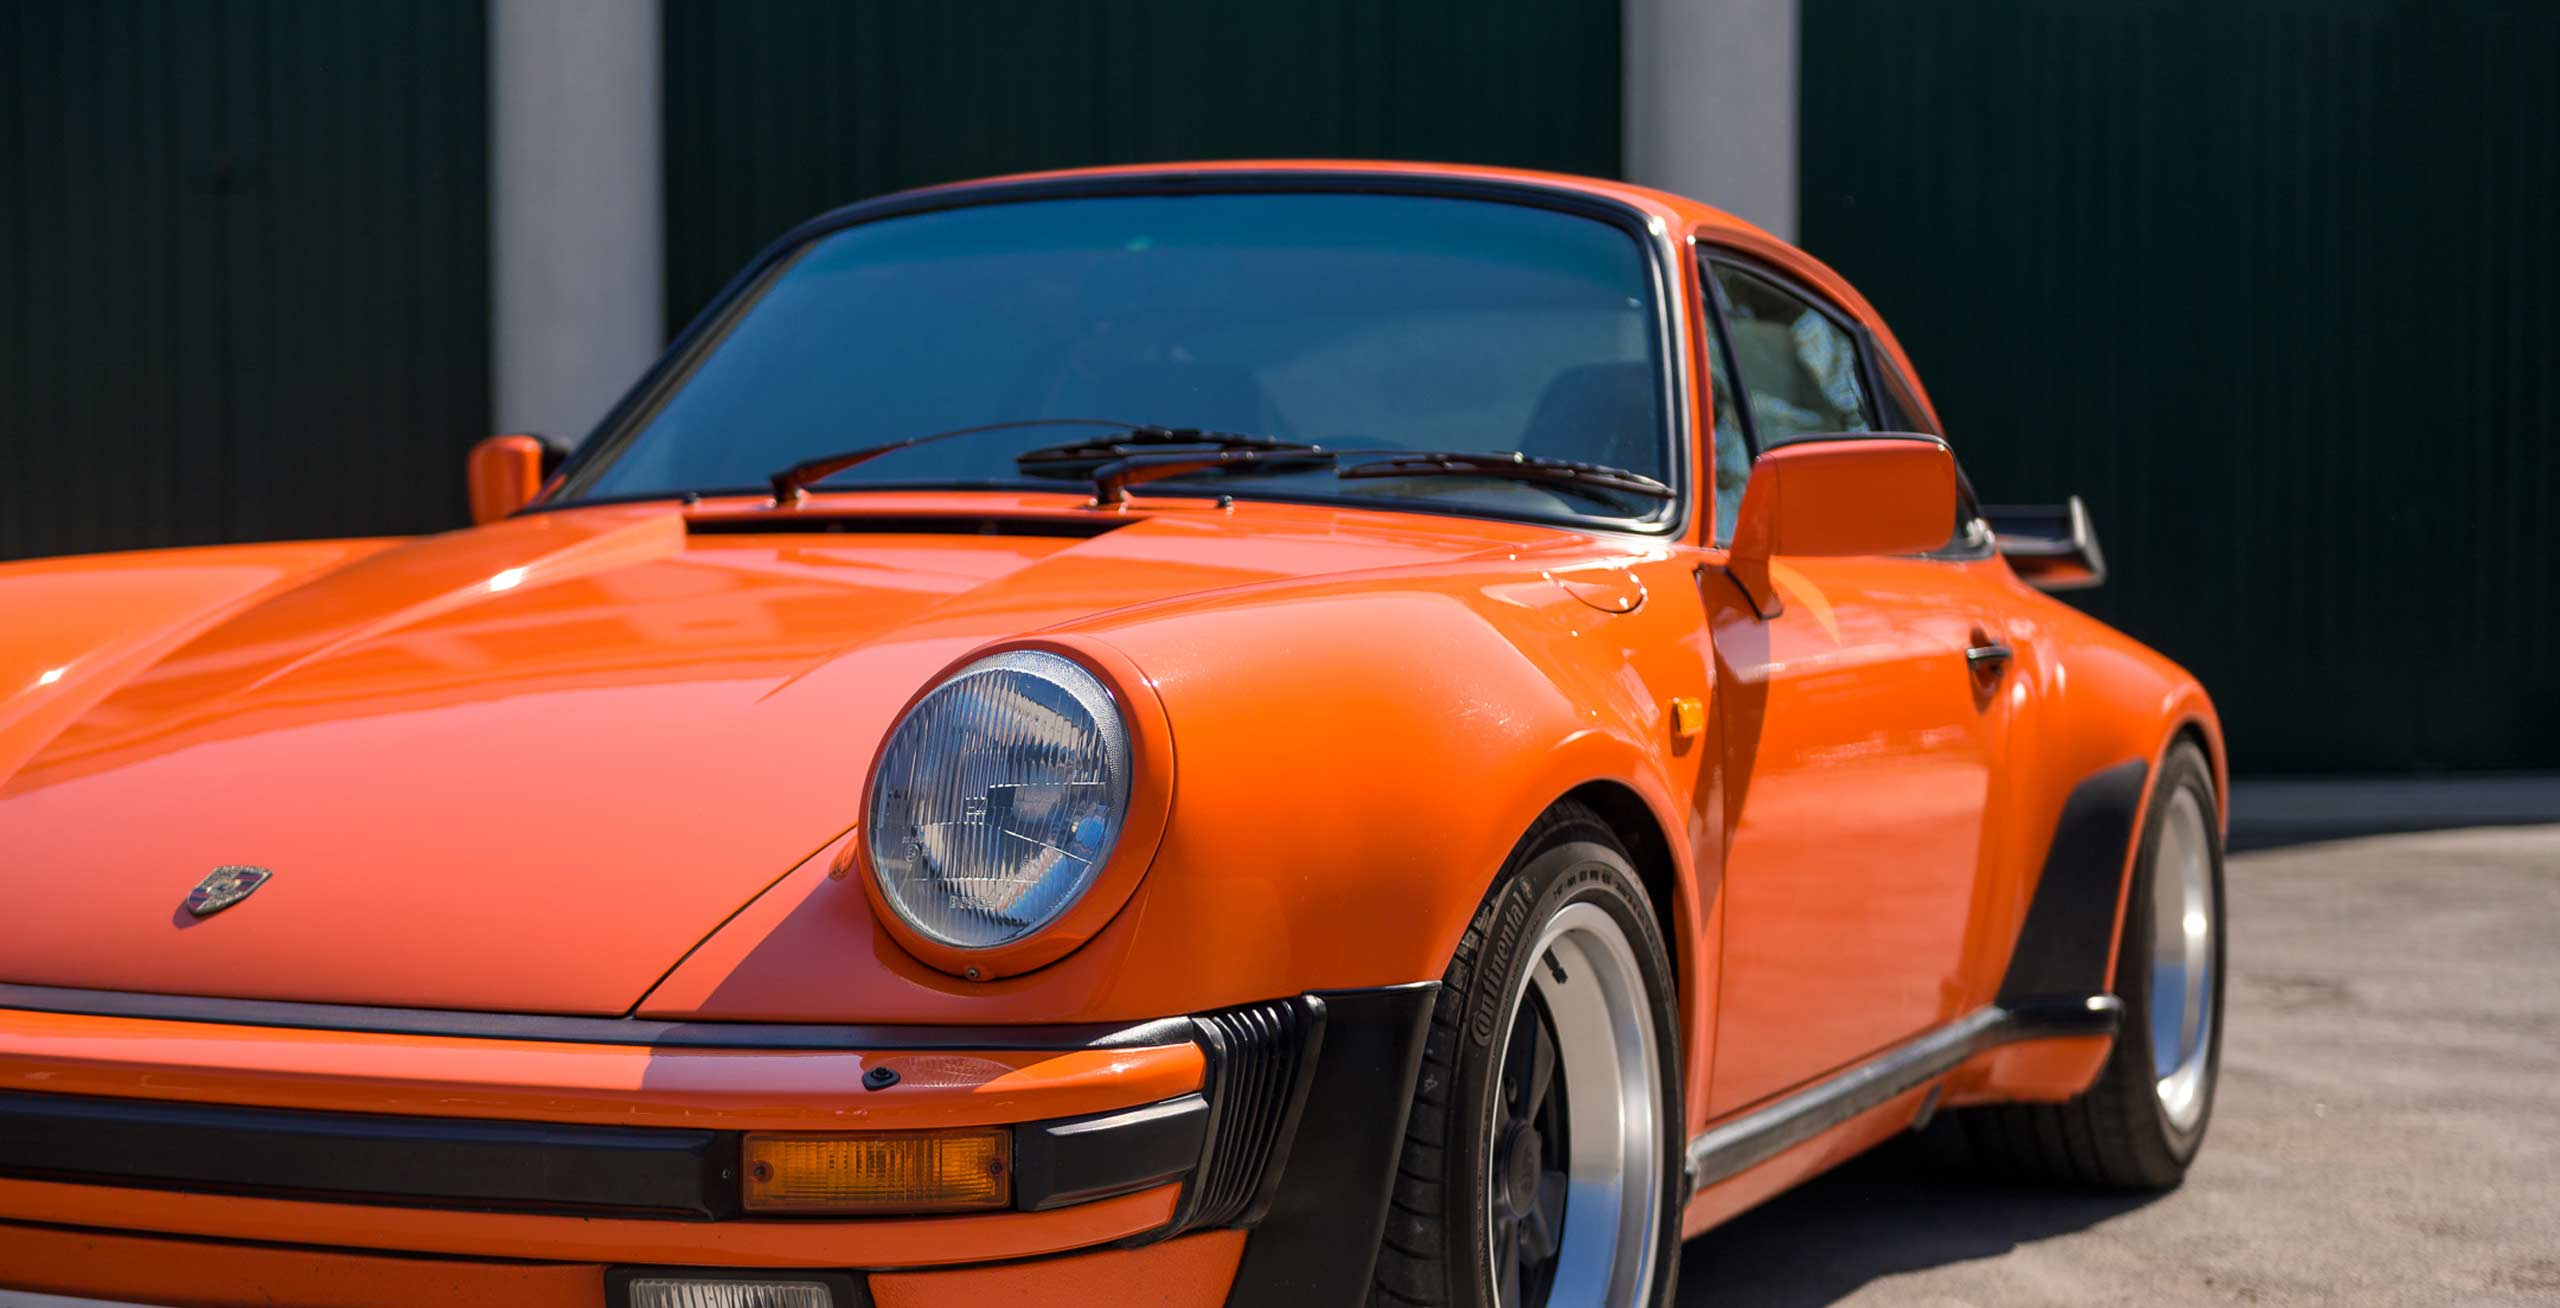 1980 Porsche 911 Turbo 3.3